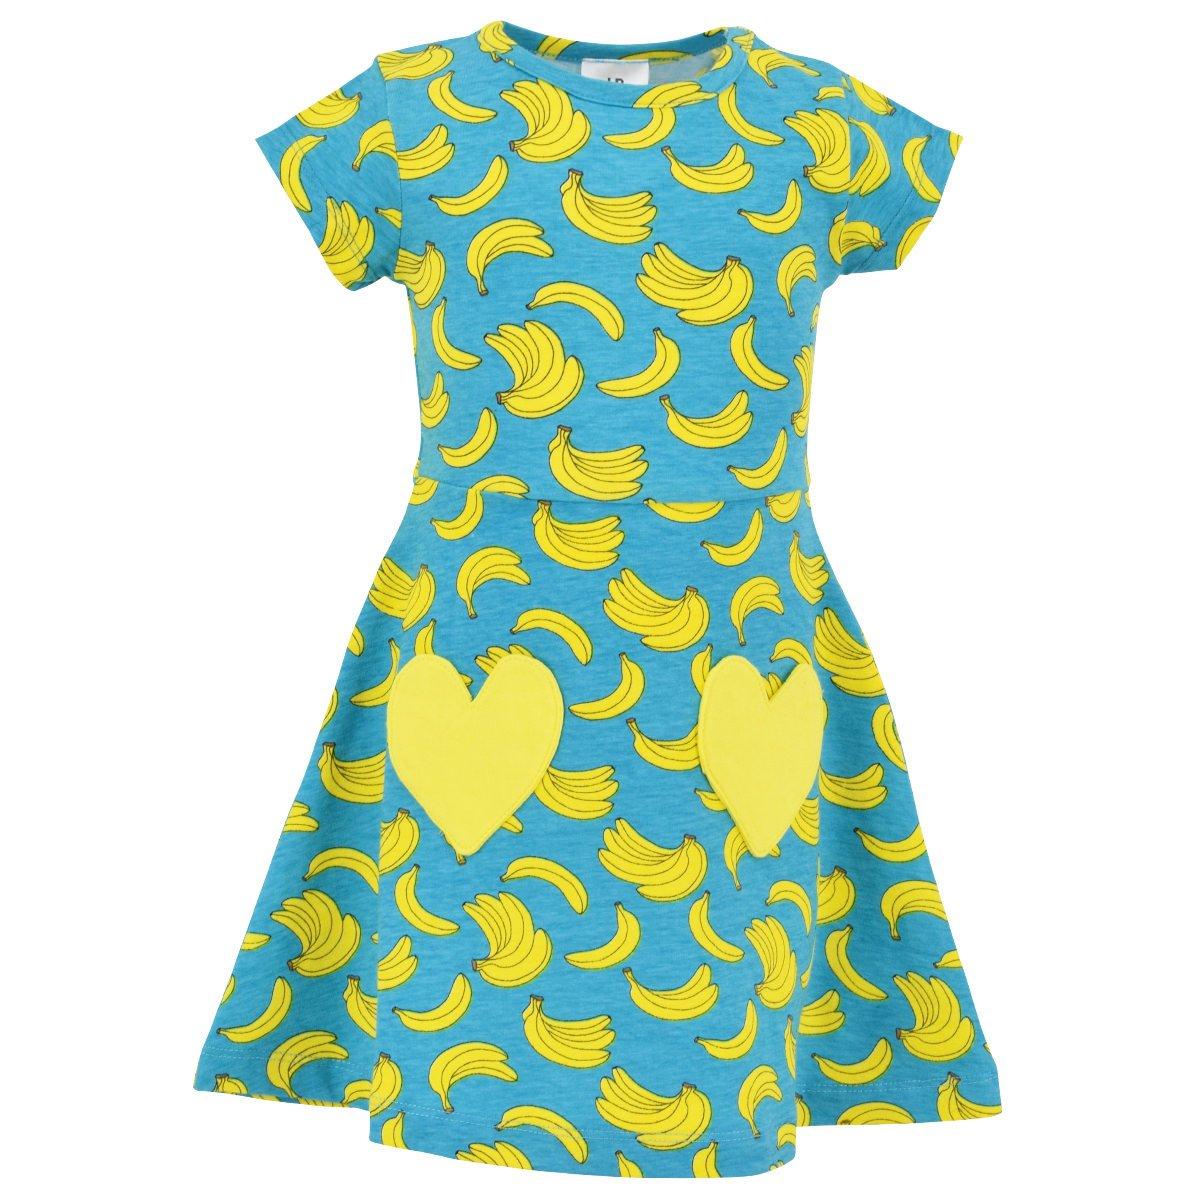 606b10ad2cc03 Amazon.com  Unique Baby Girls Spring Summer Banana Dress  Clothing